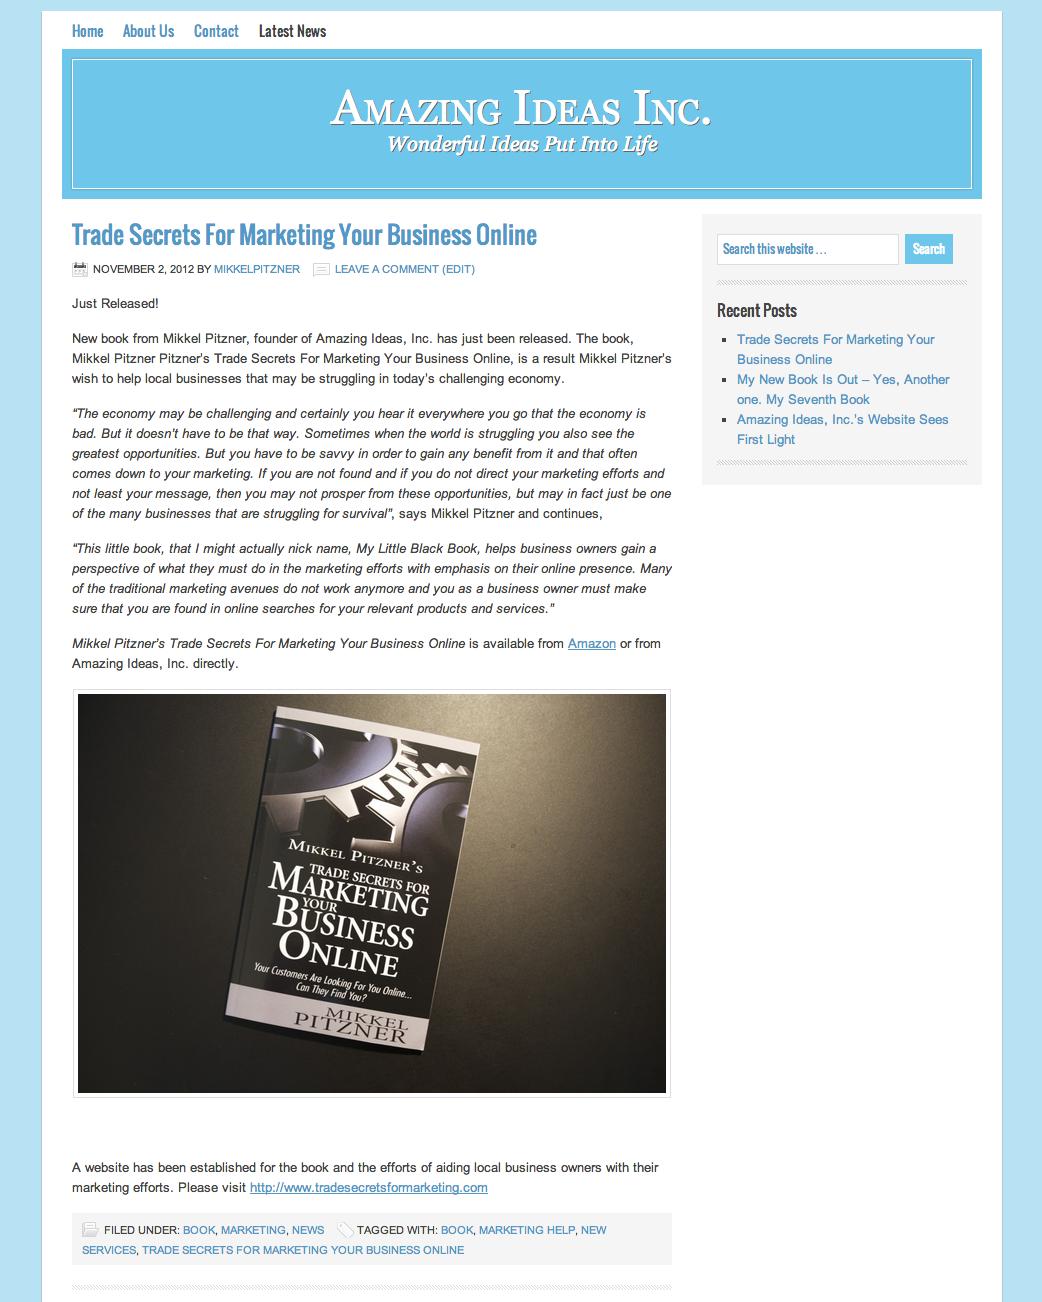 Amazing Ideas Inc Website early Nov 2012